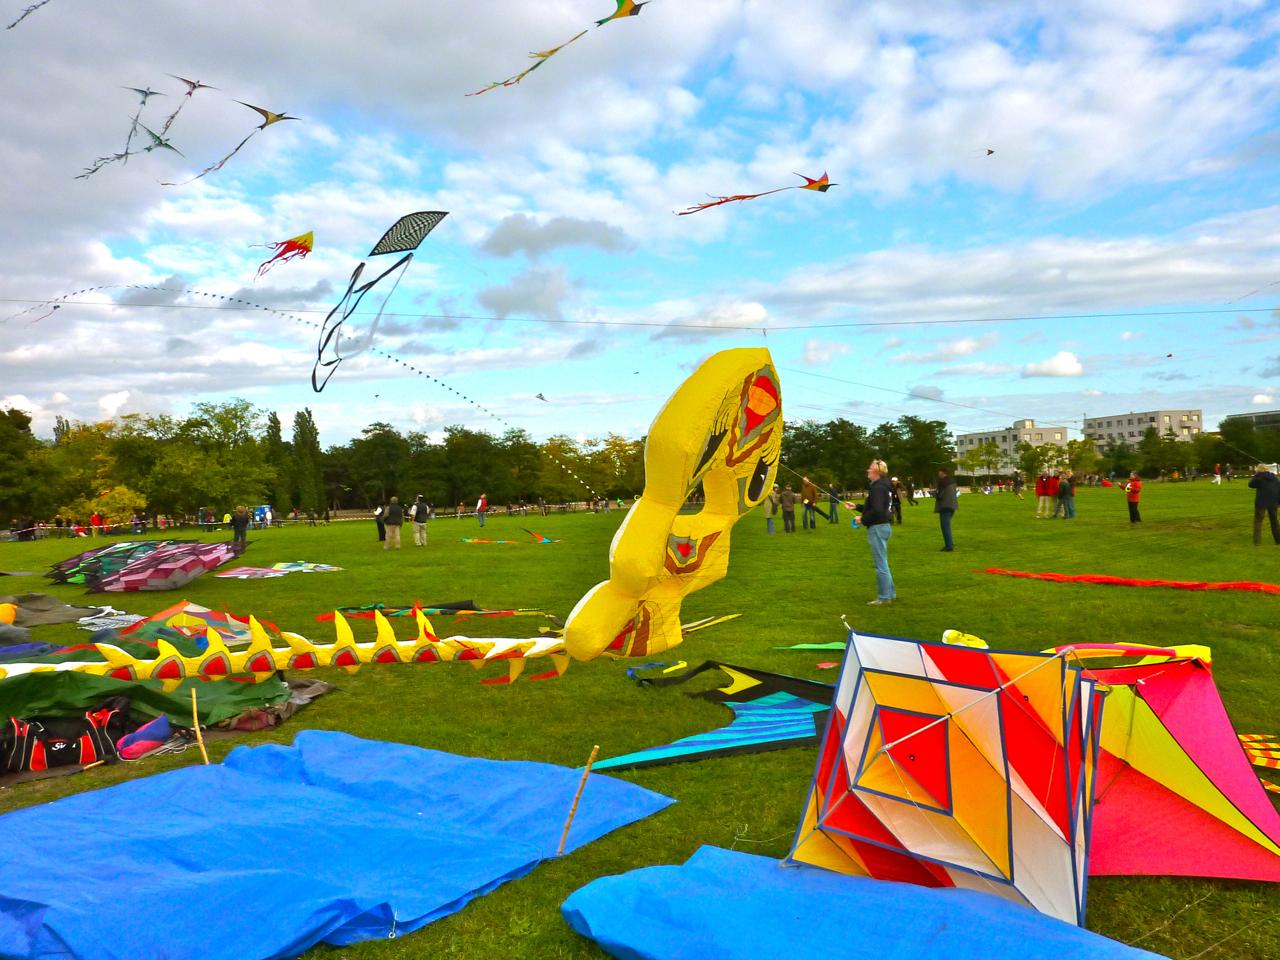 volkspark-potsdam-6-drachenfest